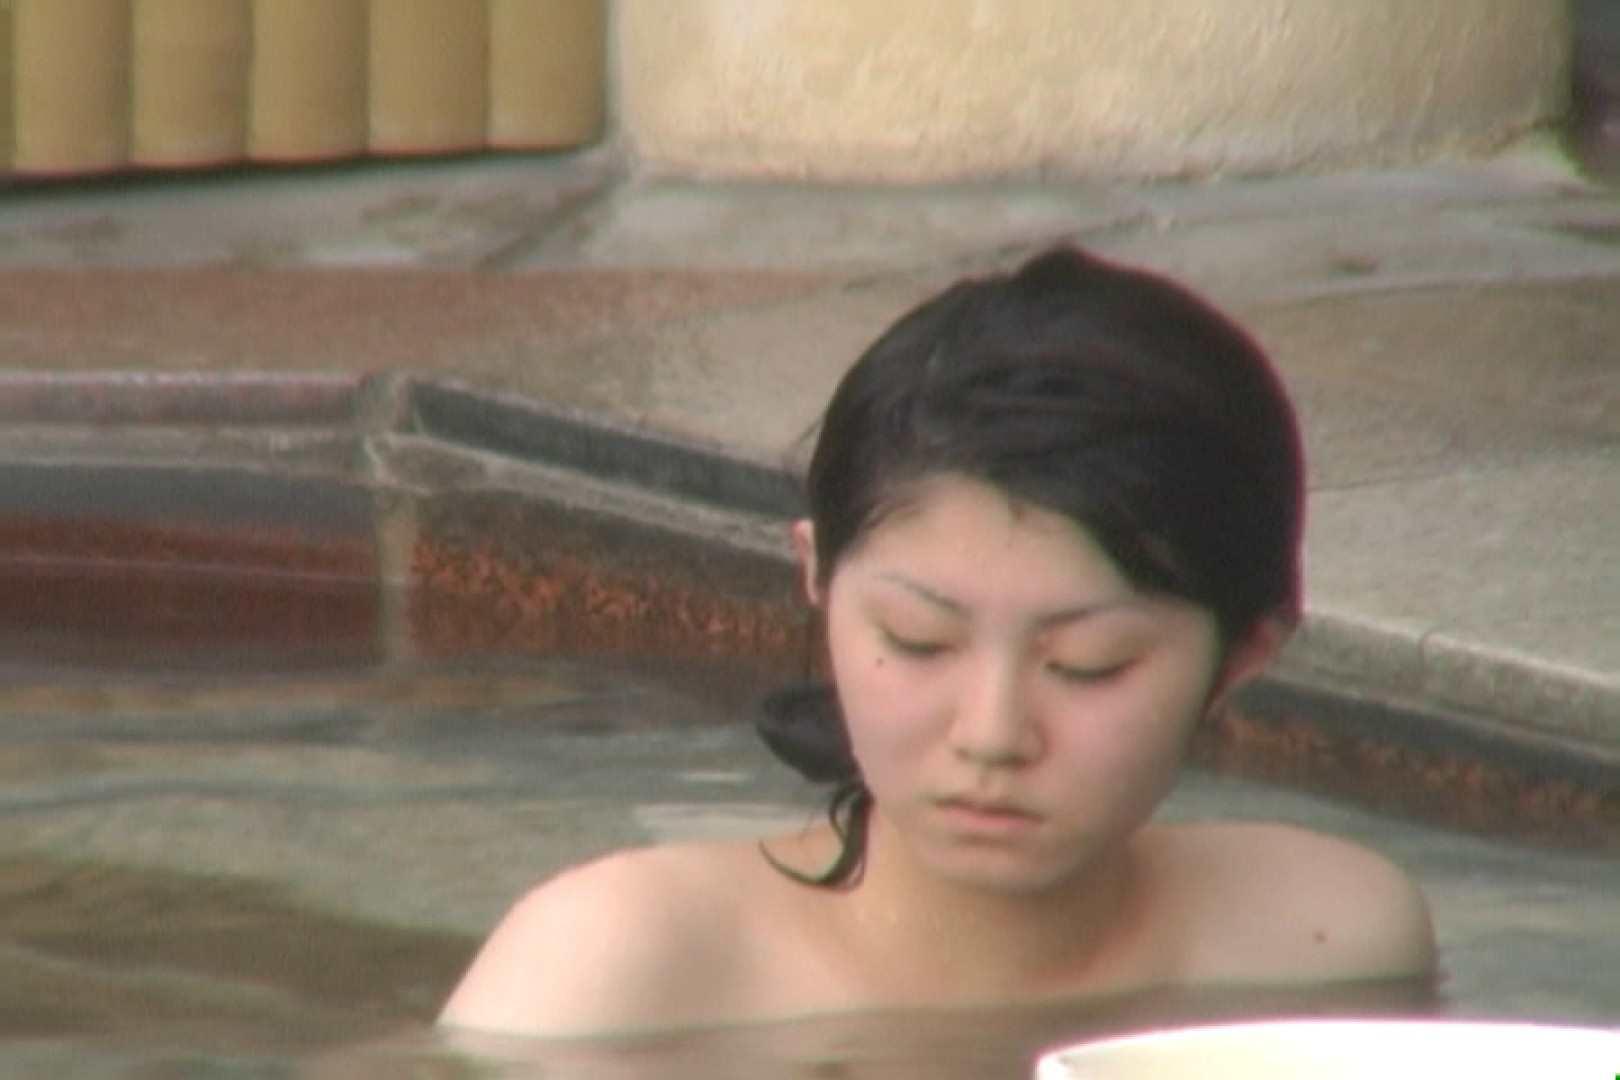 Aquaな露天風呂Vol.579 OL女体 | 露天  72連発 61